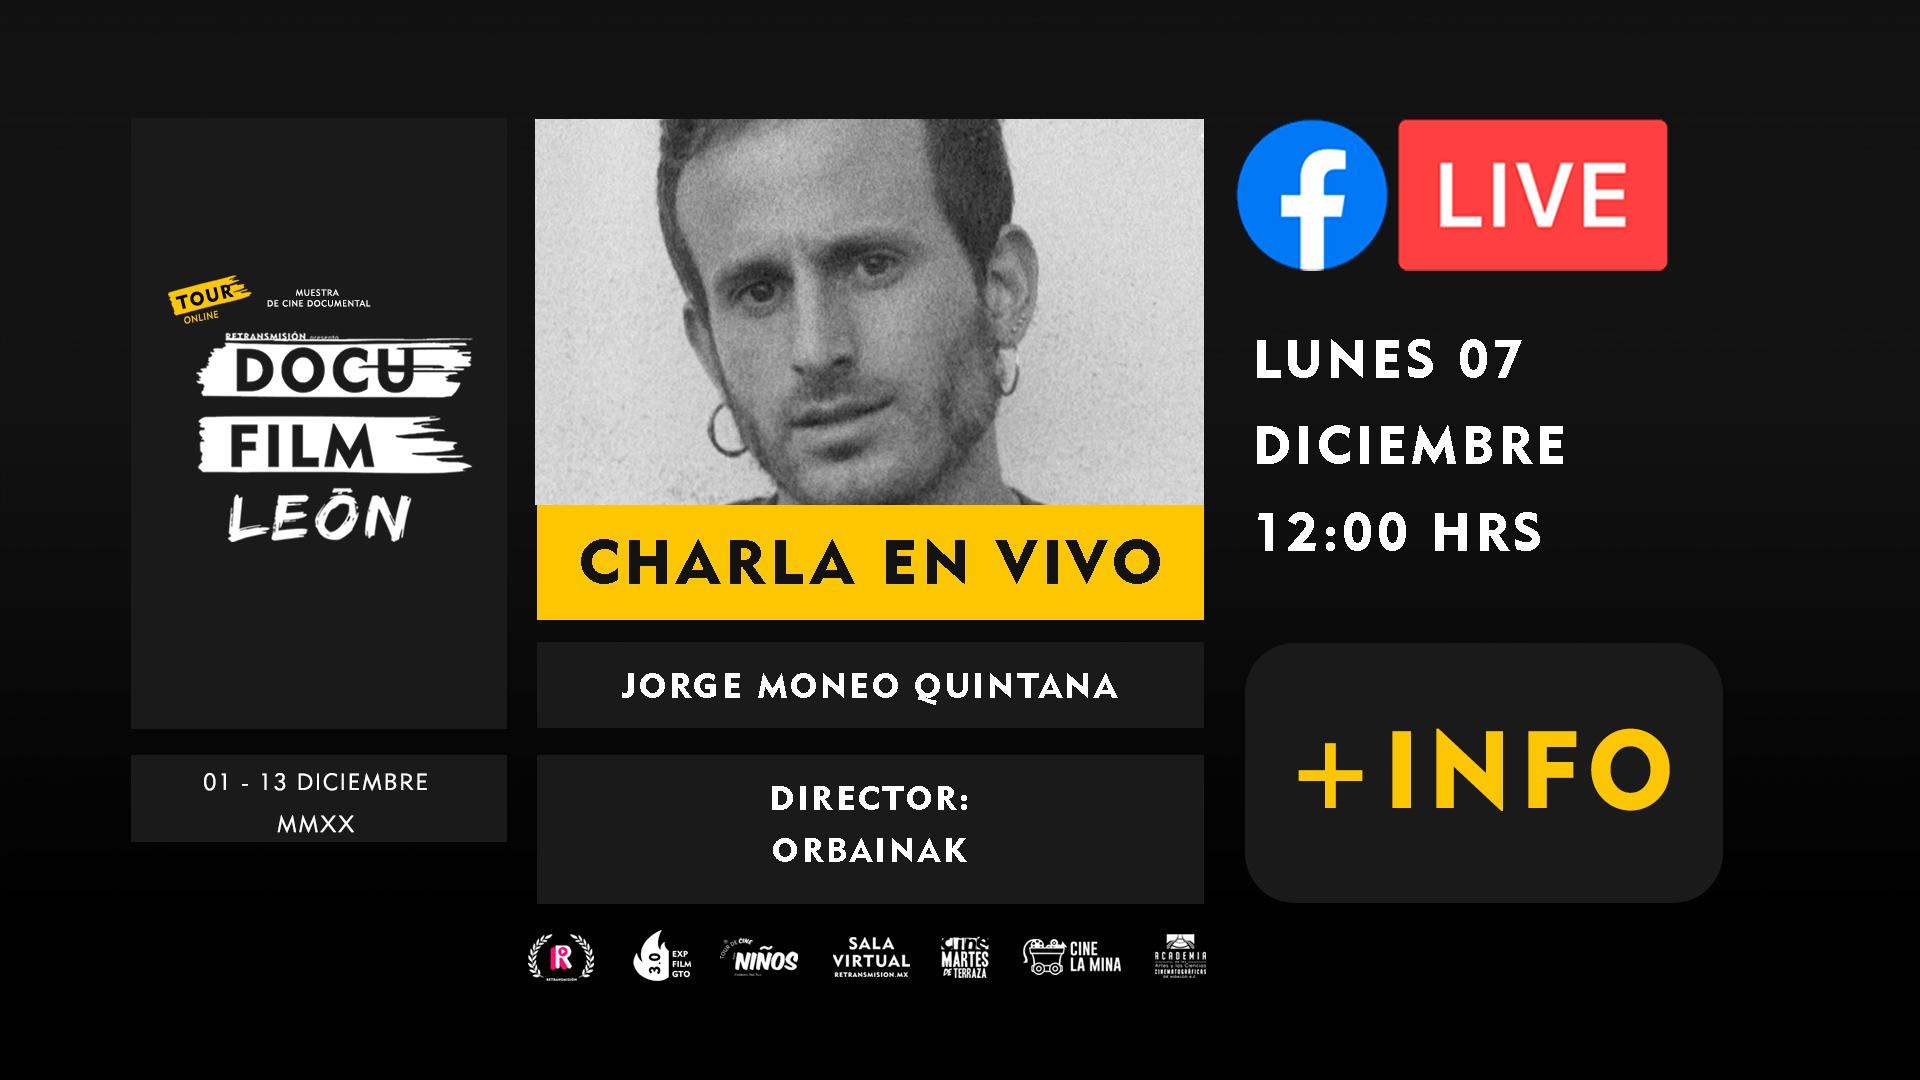 DIRECTORES-charlas+JORGE-QUINTANA-MONEO-DOCU-FILM-LEON-HORIZONTAL